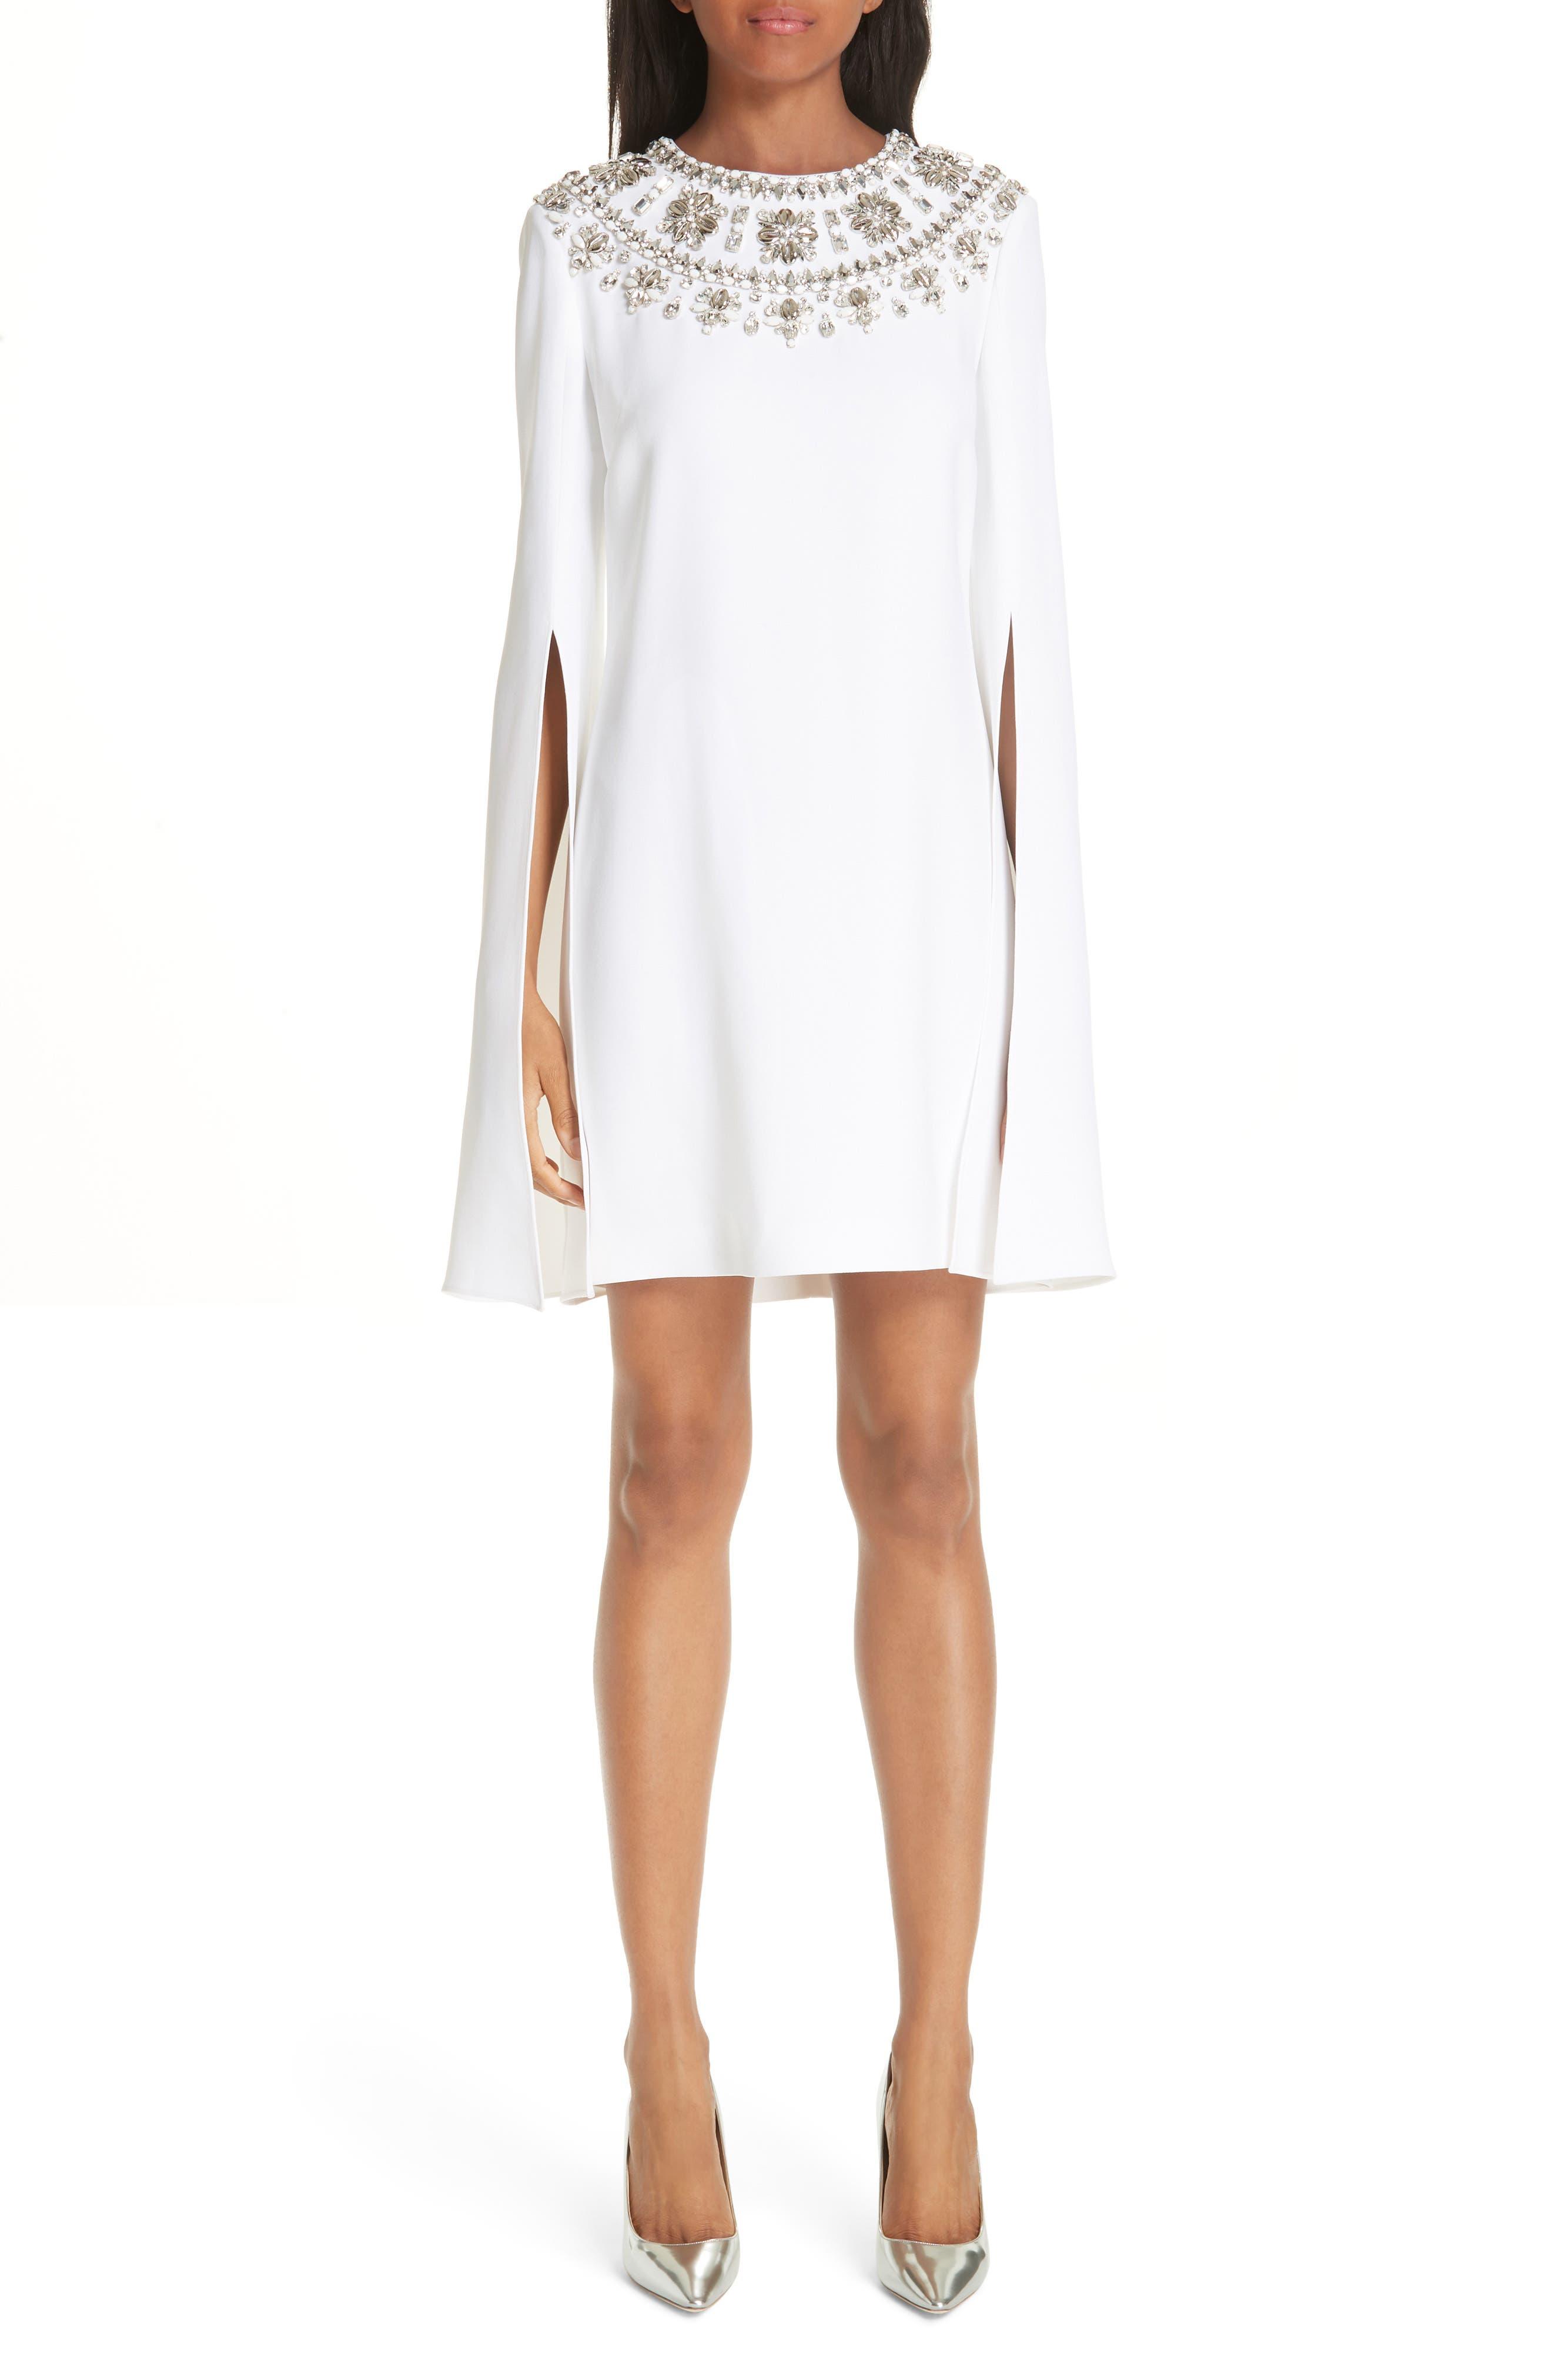 MICHAEL KORS, Crystal Embellished Split Sleeve Double Crepe Sable Dress, Main thumbnail 1, color, OPTIC WHITE W/ SILVER